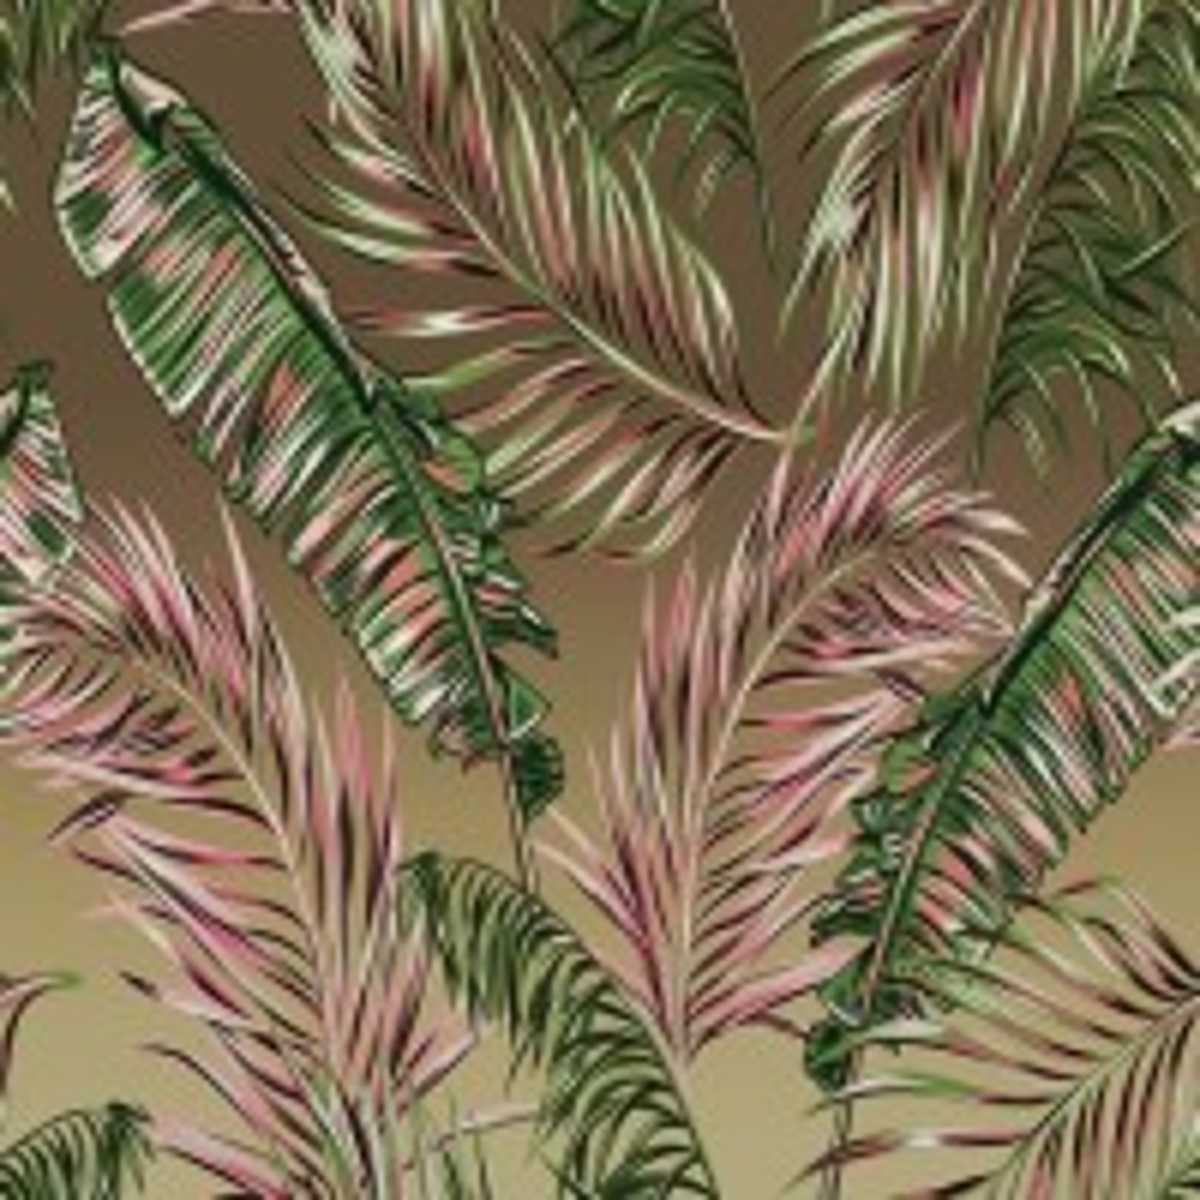 Charcoal Banana and Palm Leaves Wallpaper Mural